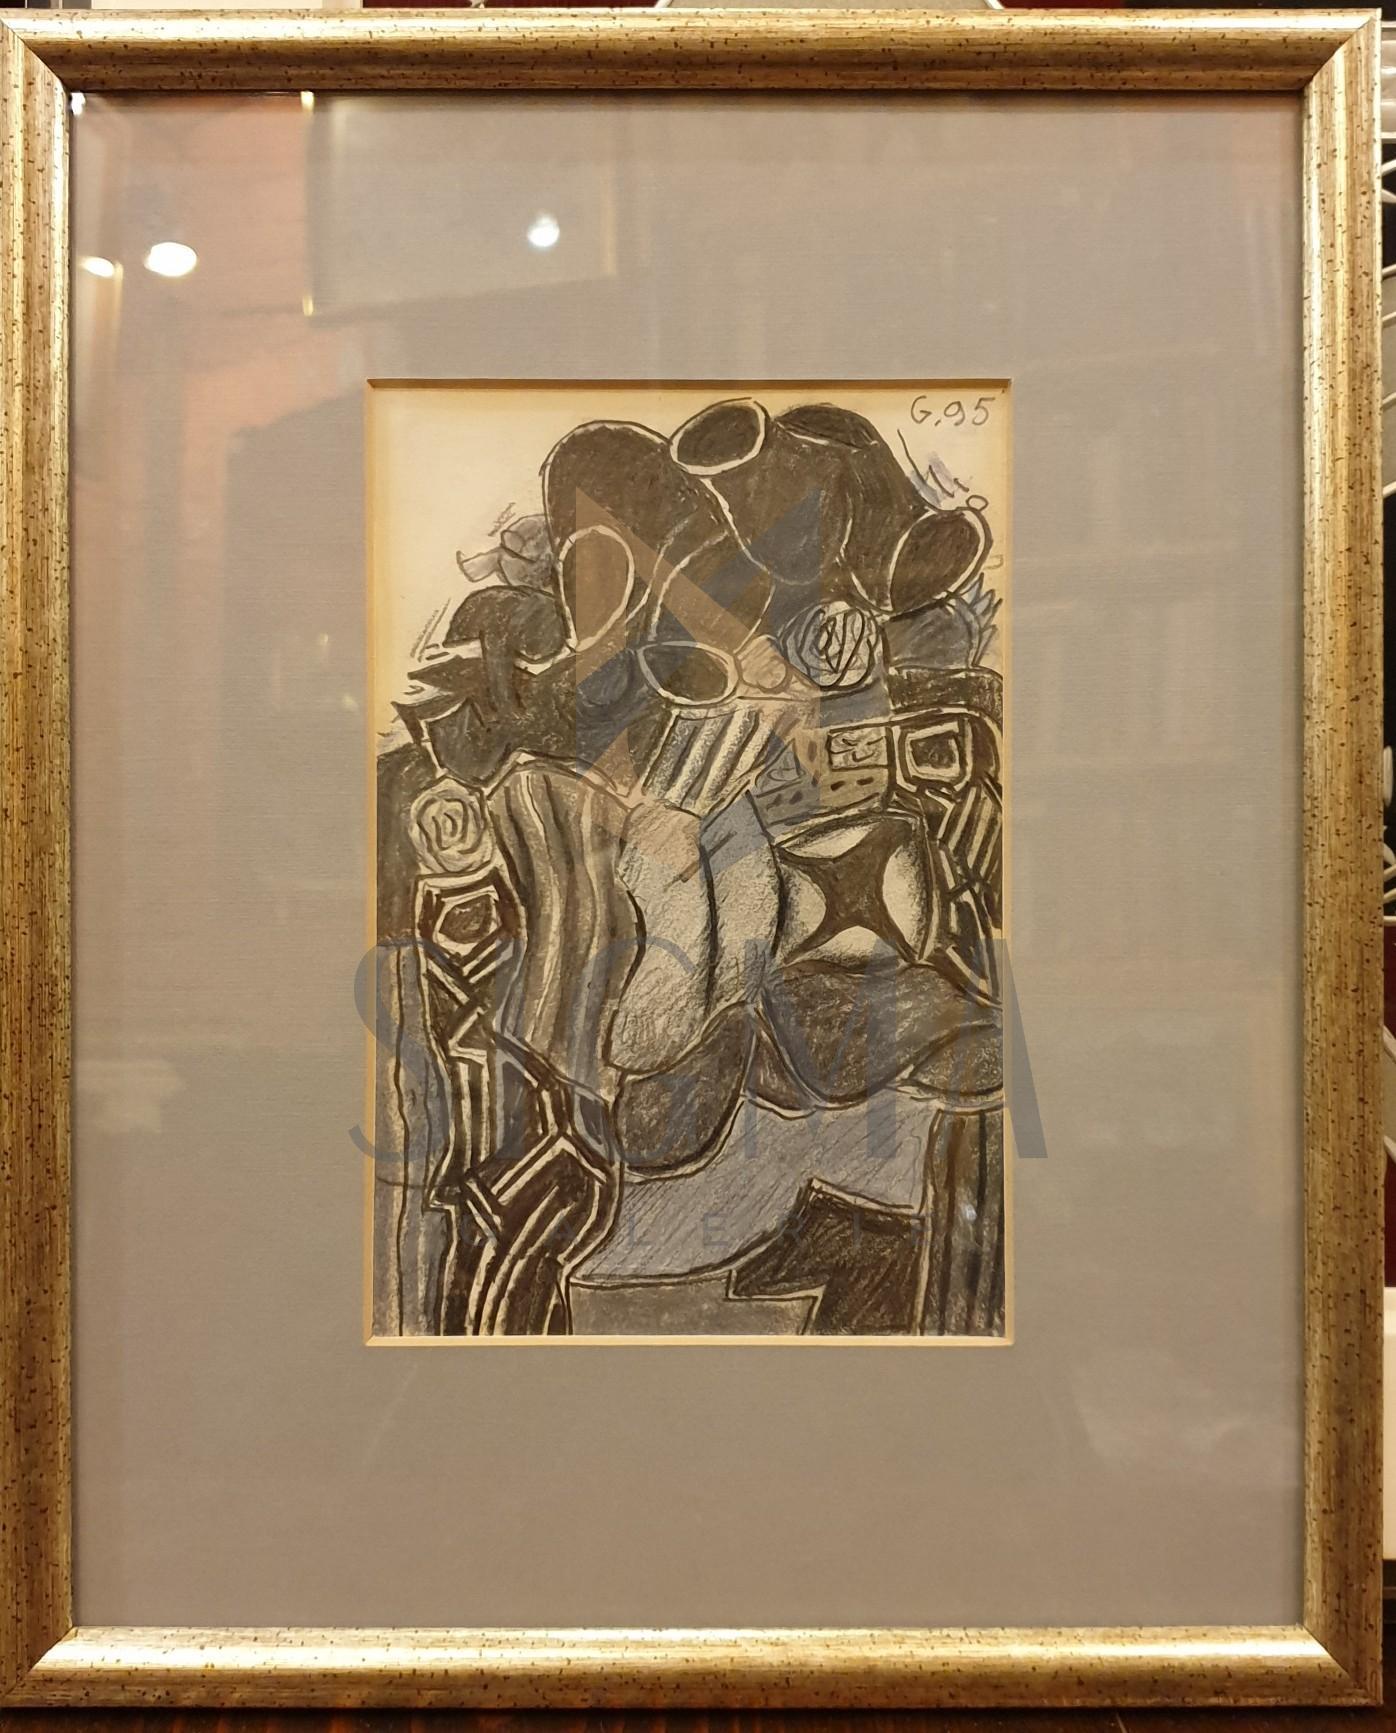 "TABLOU, ION ALIN GHEORGHIU, ""CITADINA SUSPENDATA"" , tehnica mixta, 1995"